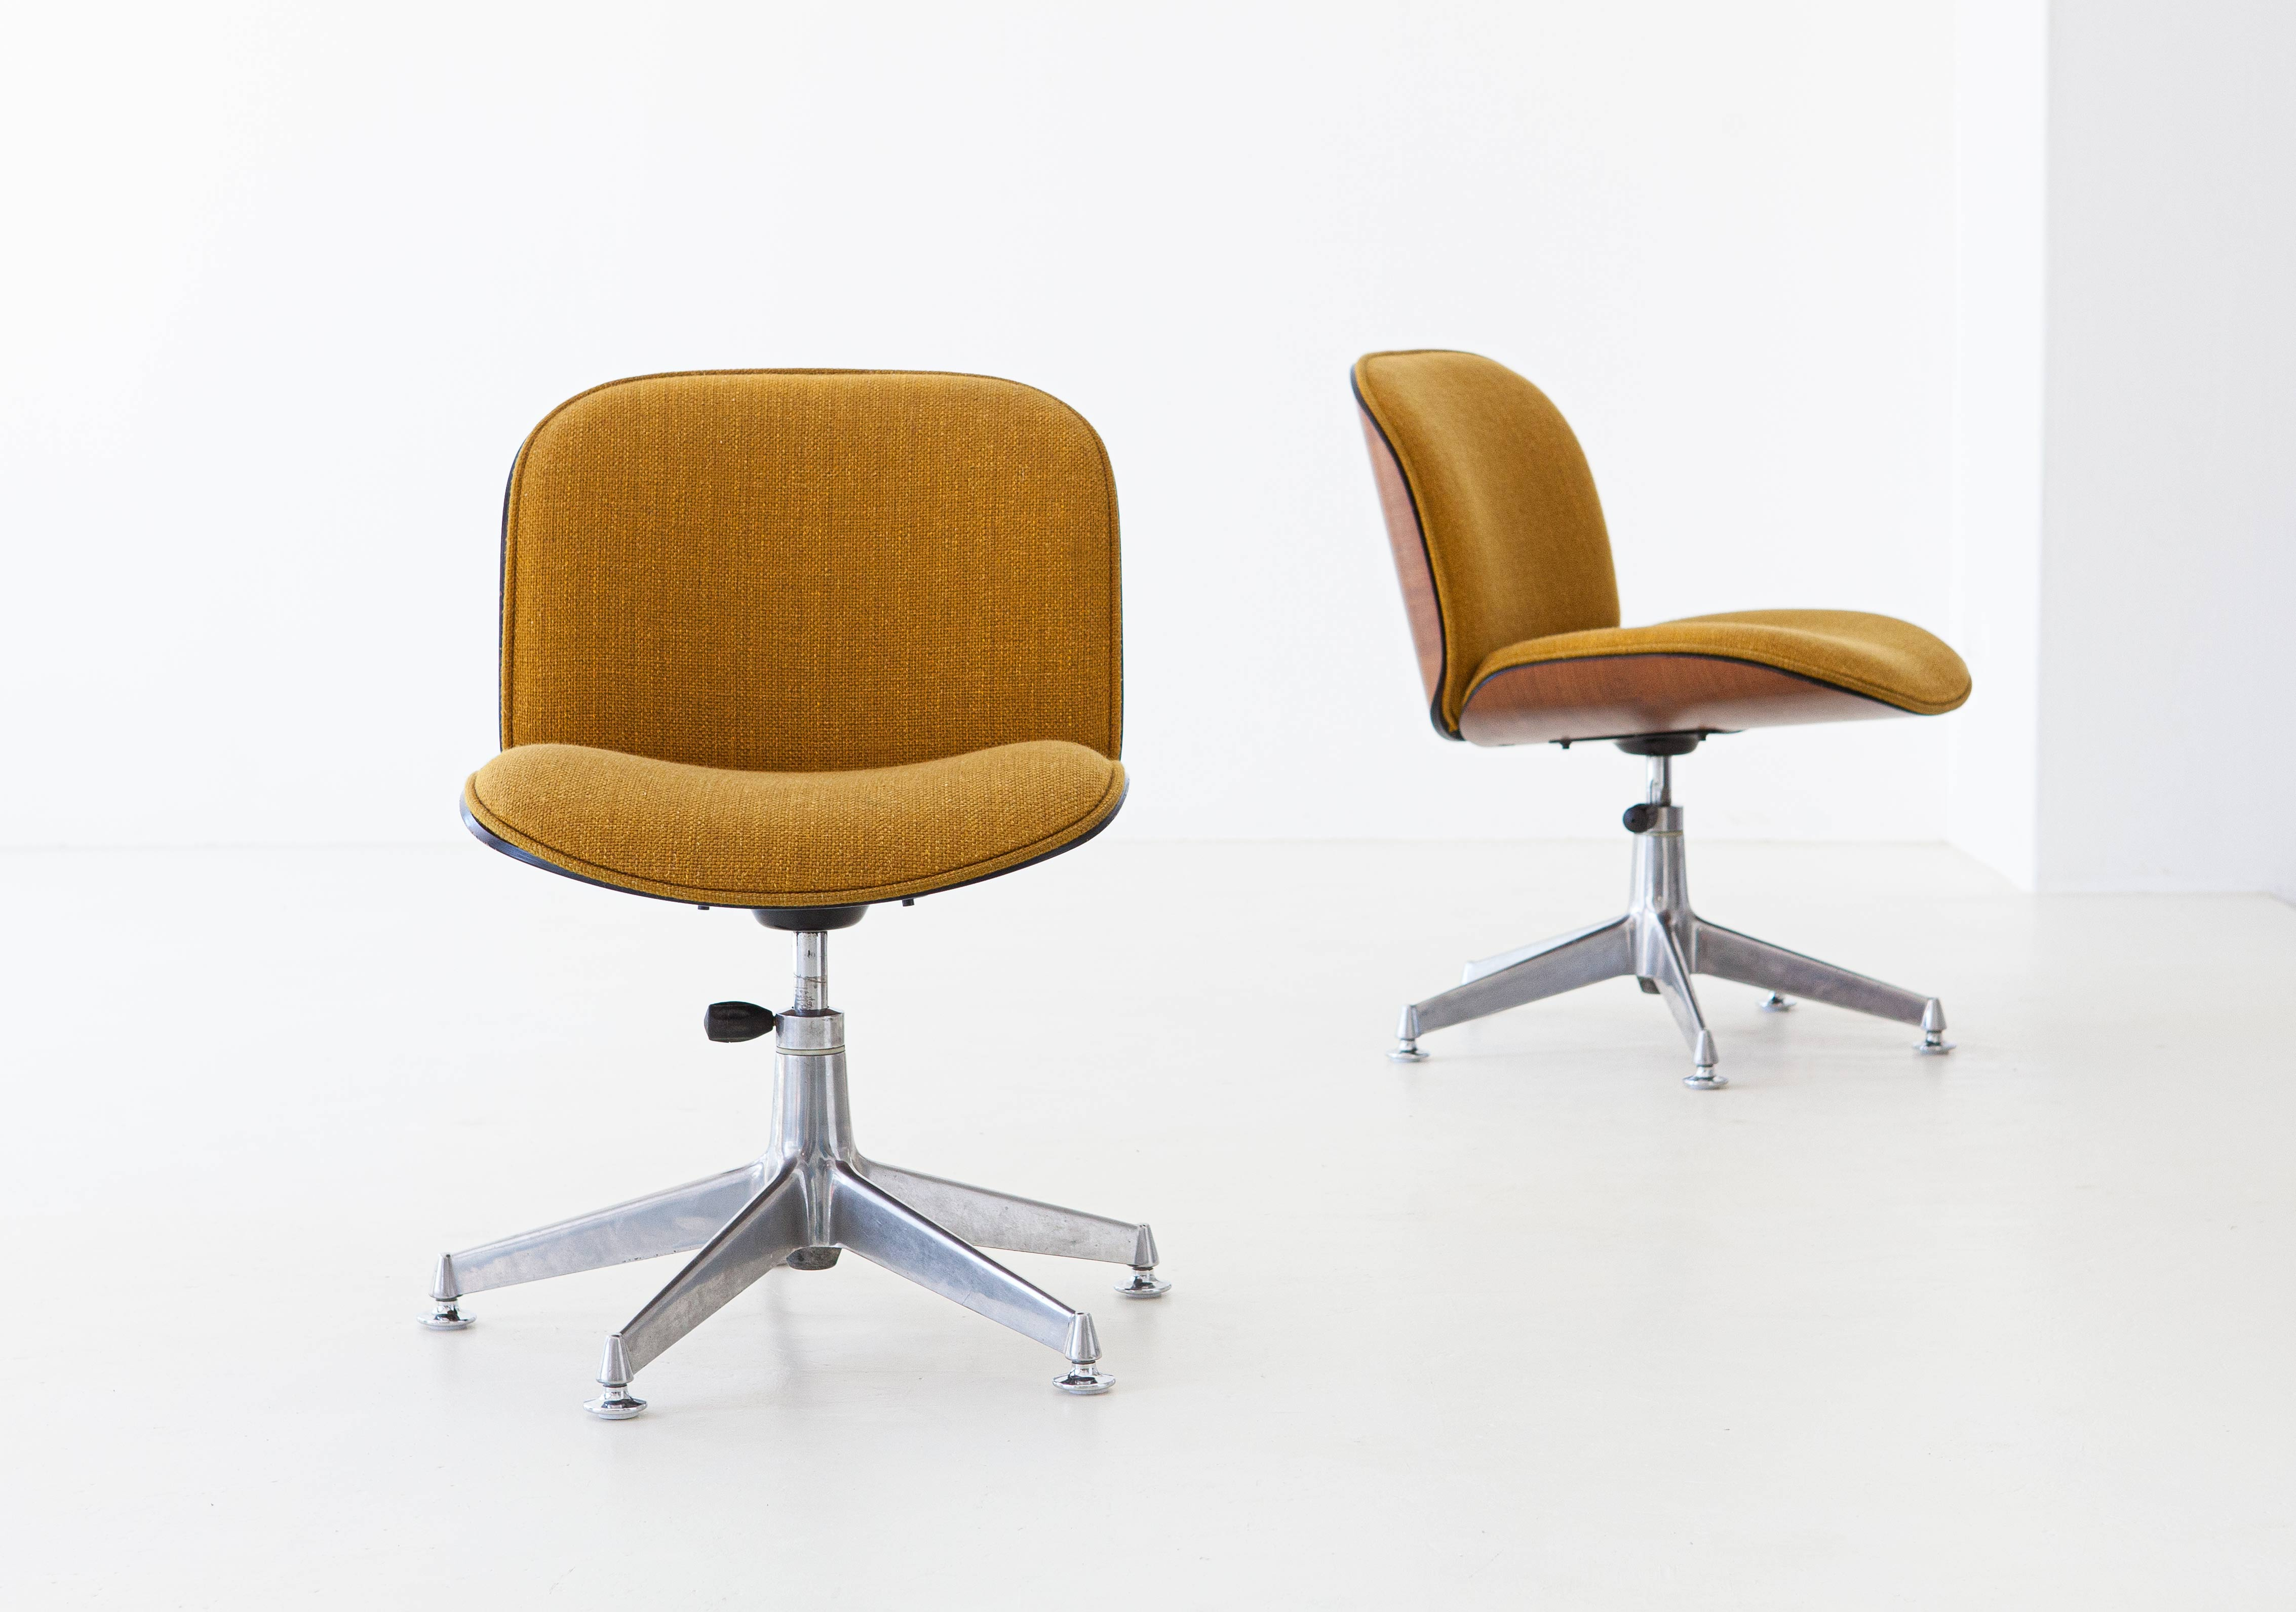 1950s-ico-parisi-for-mim-walnut-swivel-desk-chairs-5-se305